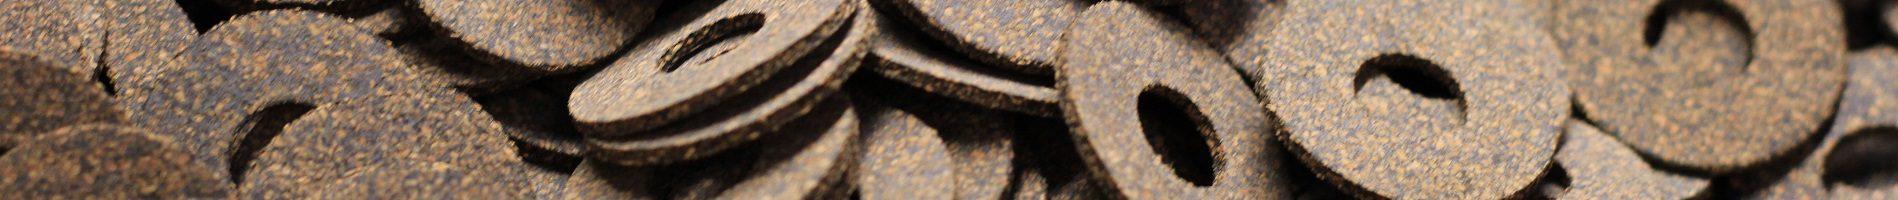 cork washers